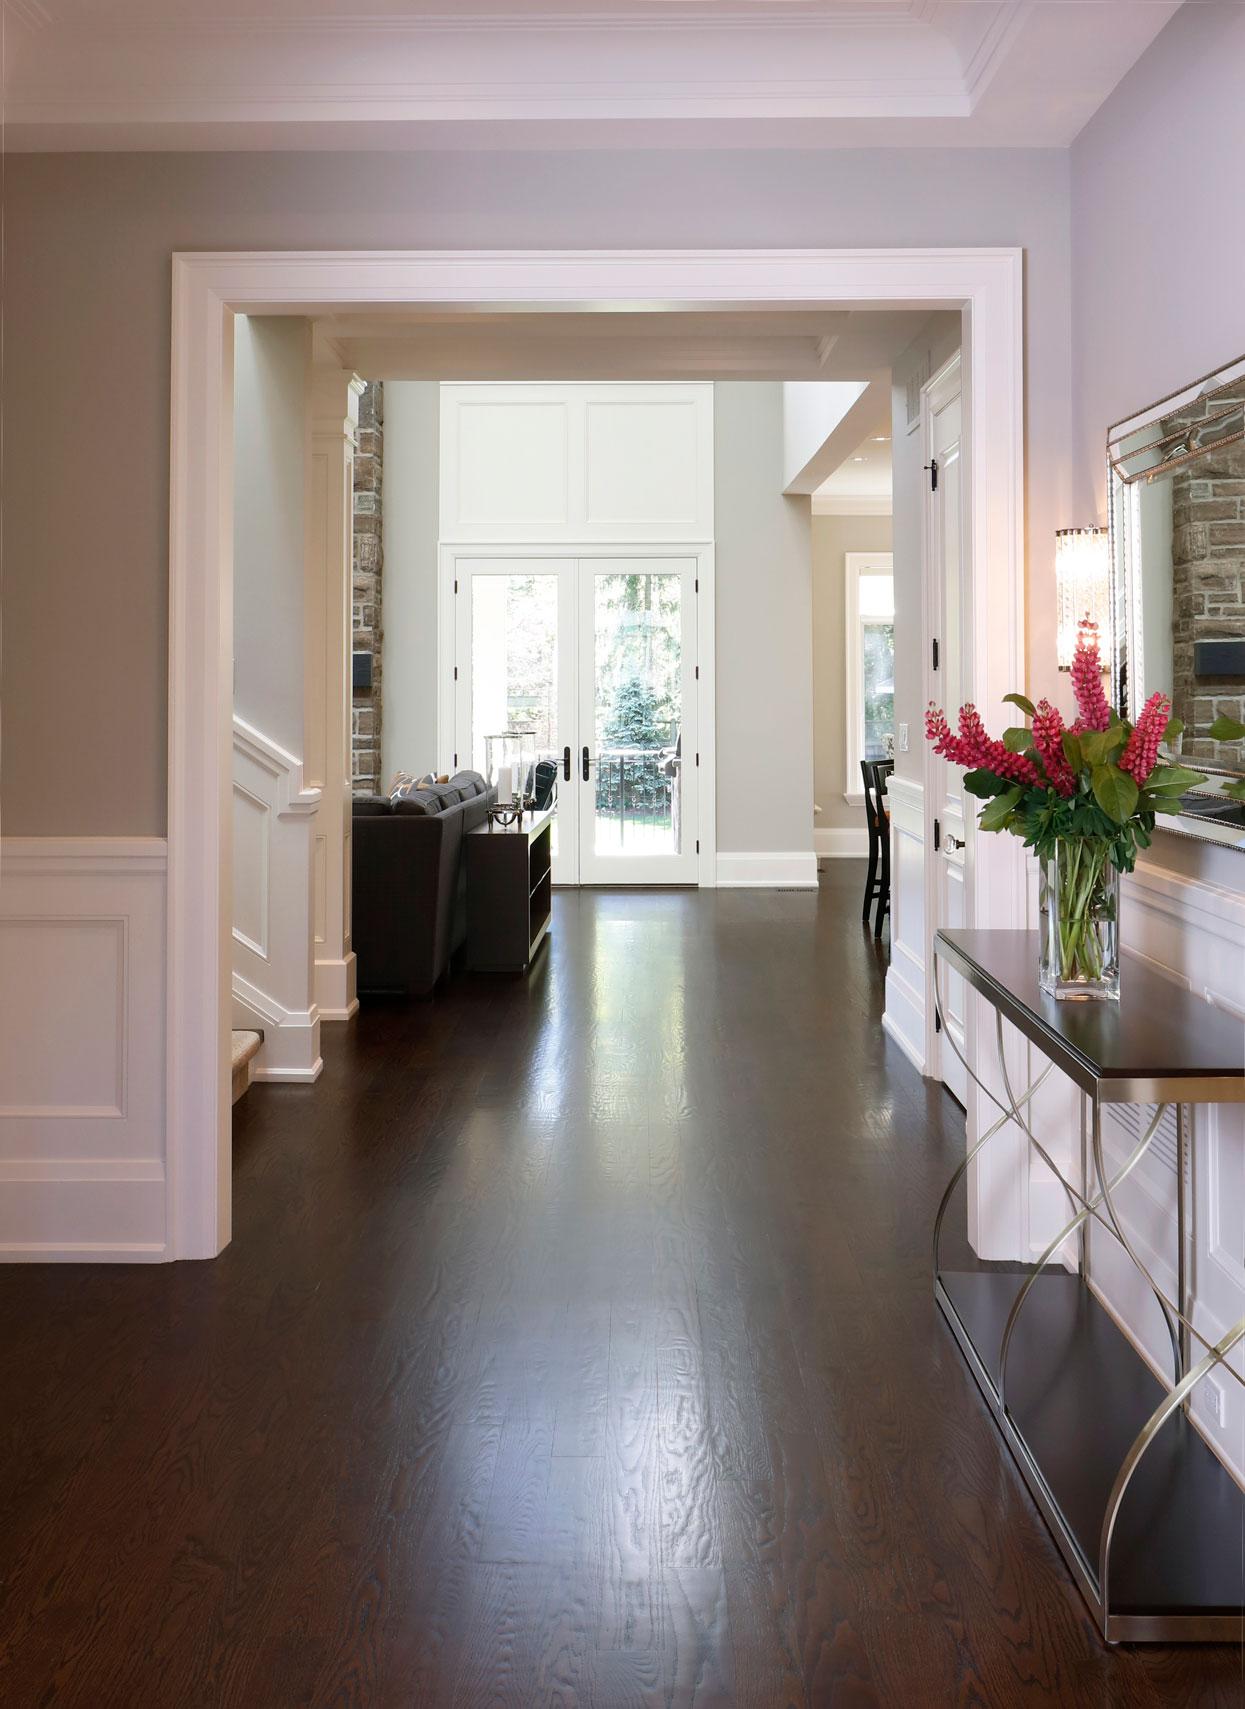 #2-FINAL-Front-Hallway-51A0481